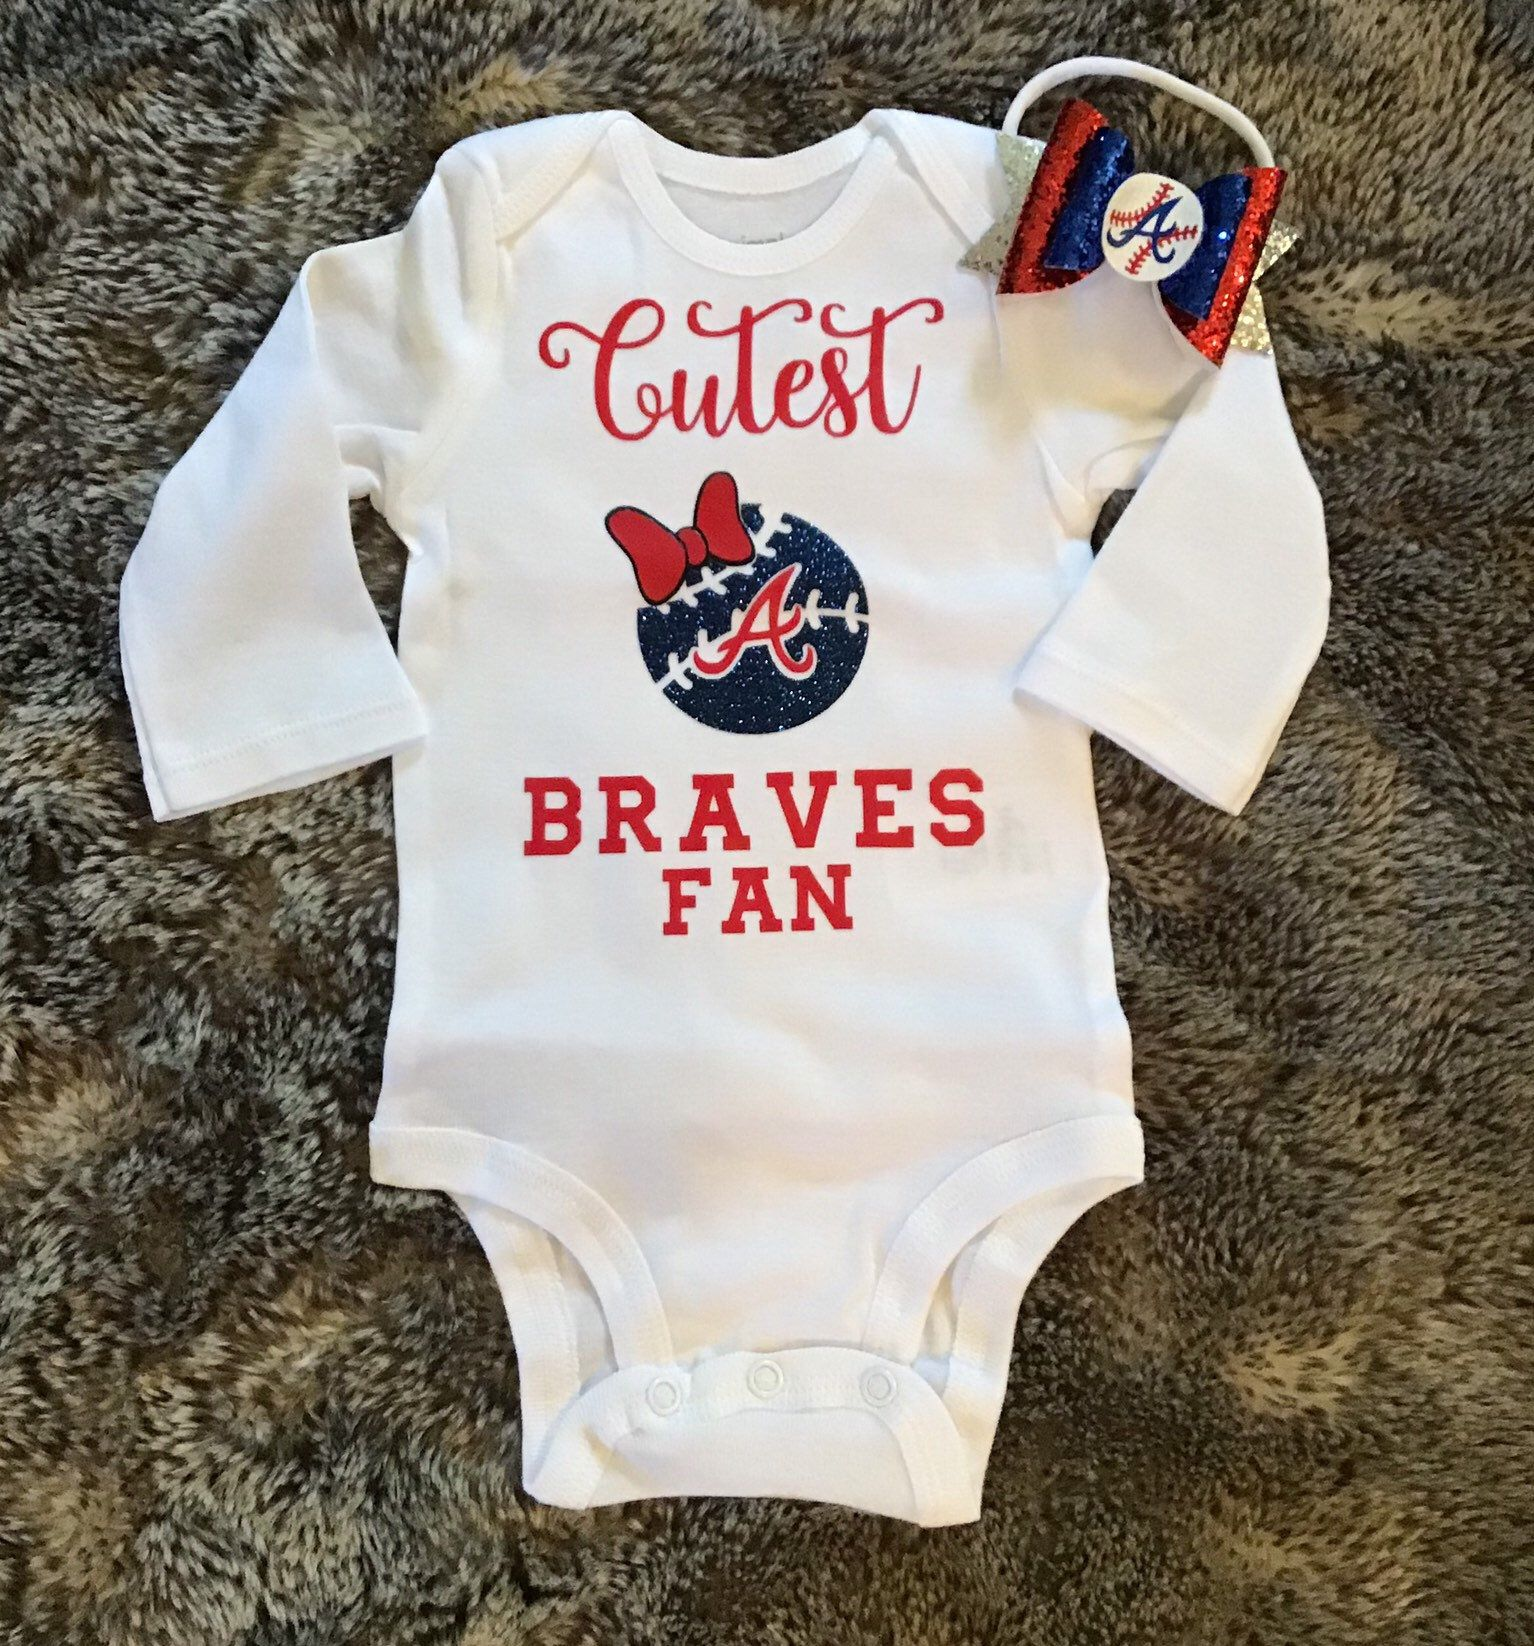 Atlanta Braves Fan Baby Girl Bodysuit Sports Baby Shower Baseball Baby Bodysuit Baseball Season Gifts Braves Photo Prop In 2020 Atlanta Braves Baby Baby Girl Bodysuit Girls Bodysuit